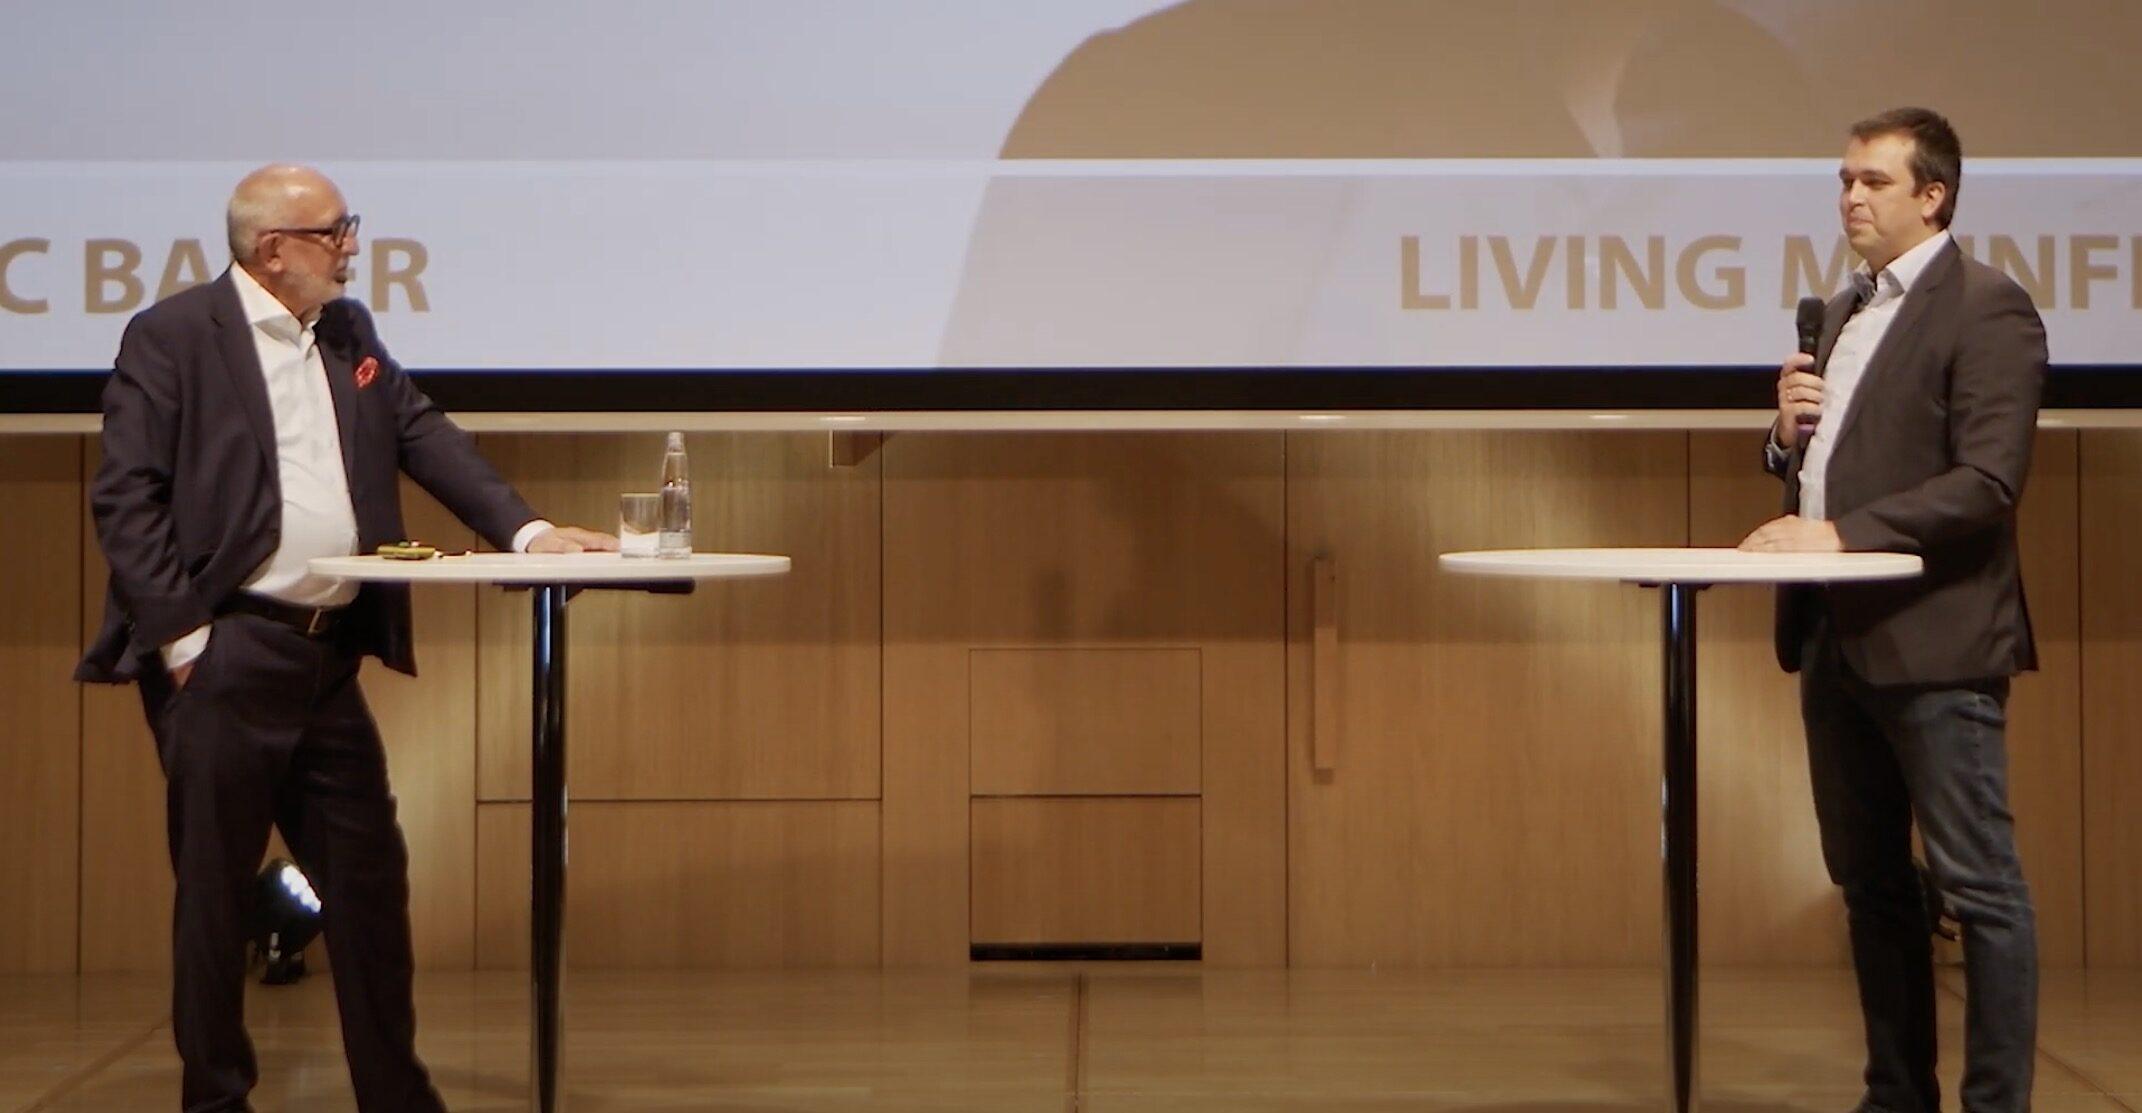 start.me.up 2020 | Gründer | Interview mit Marc Bauer | Living Mainframe GmbH